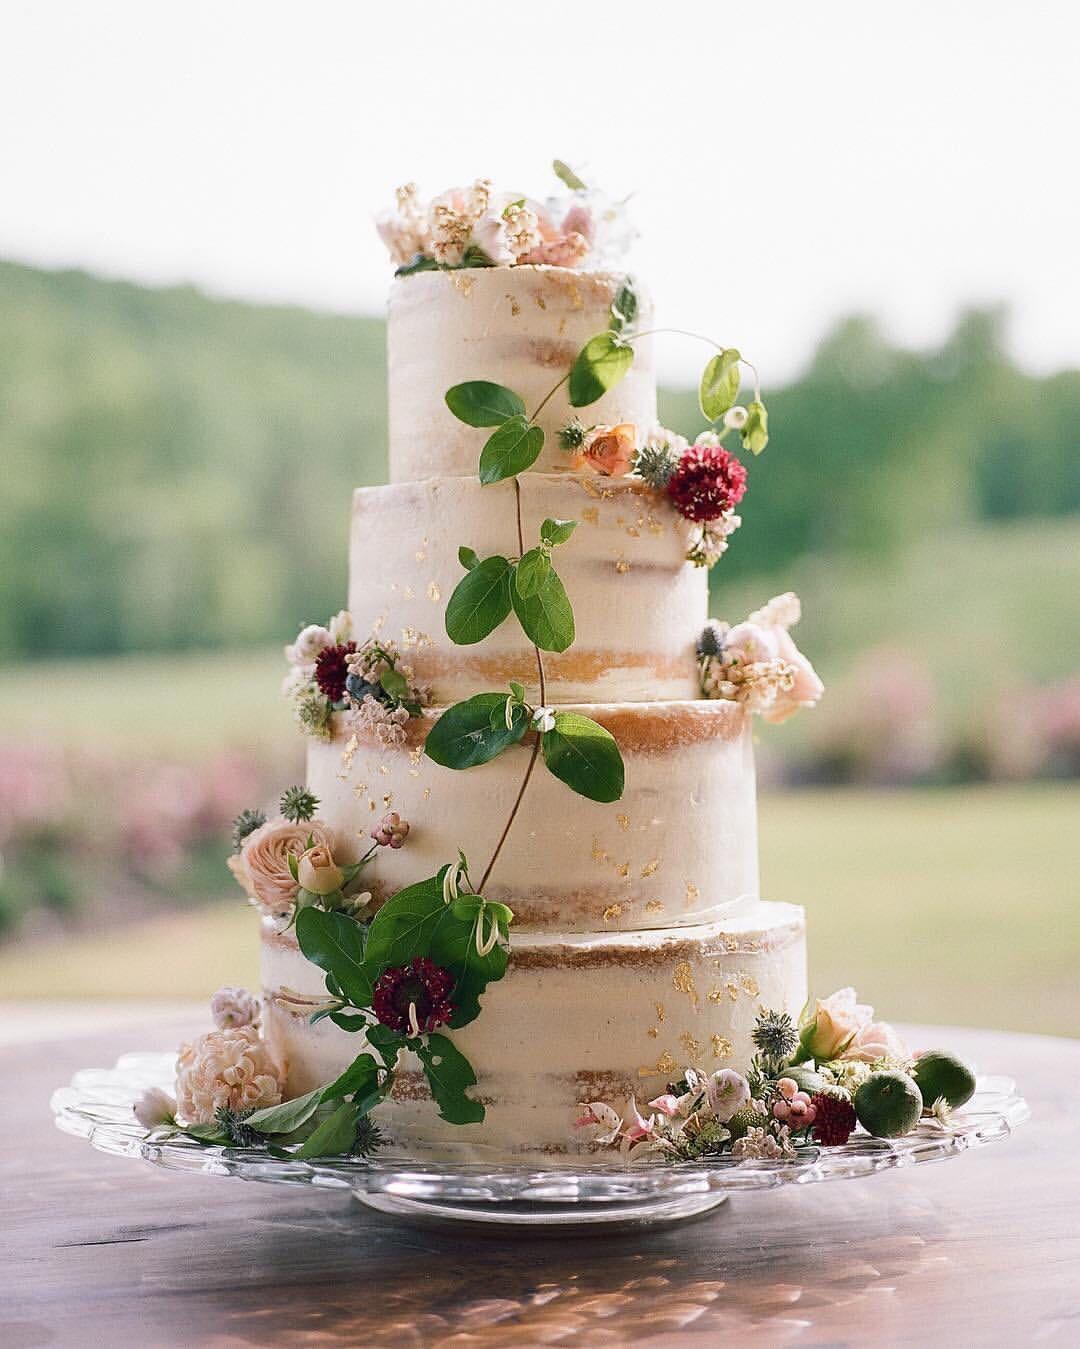 Rustic Wedding Cupcake Ideas: Top 10 Semi-naked Wedding Cakes We've Ever Seen